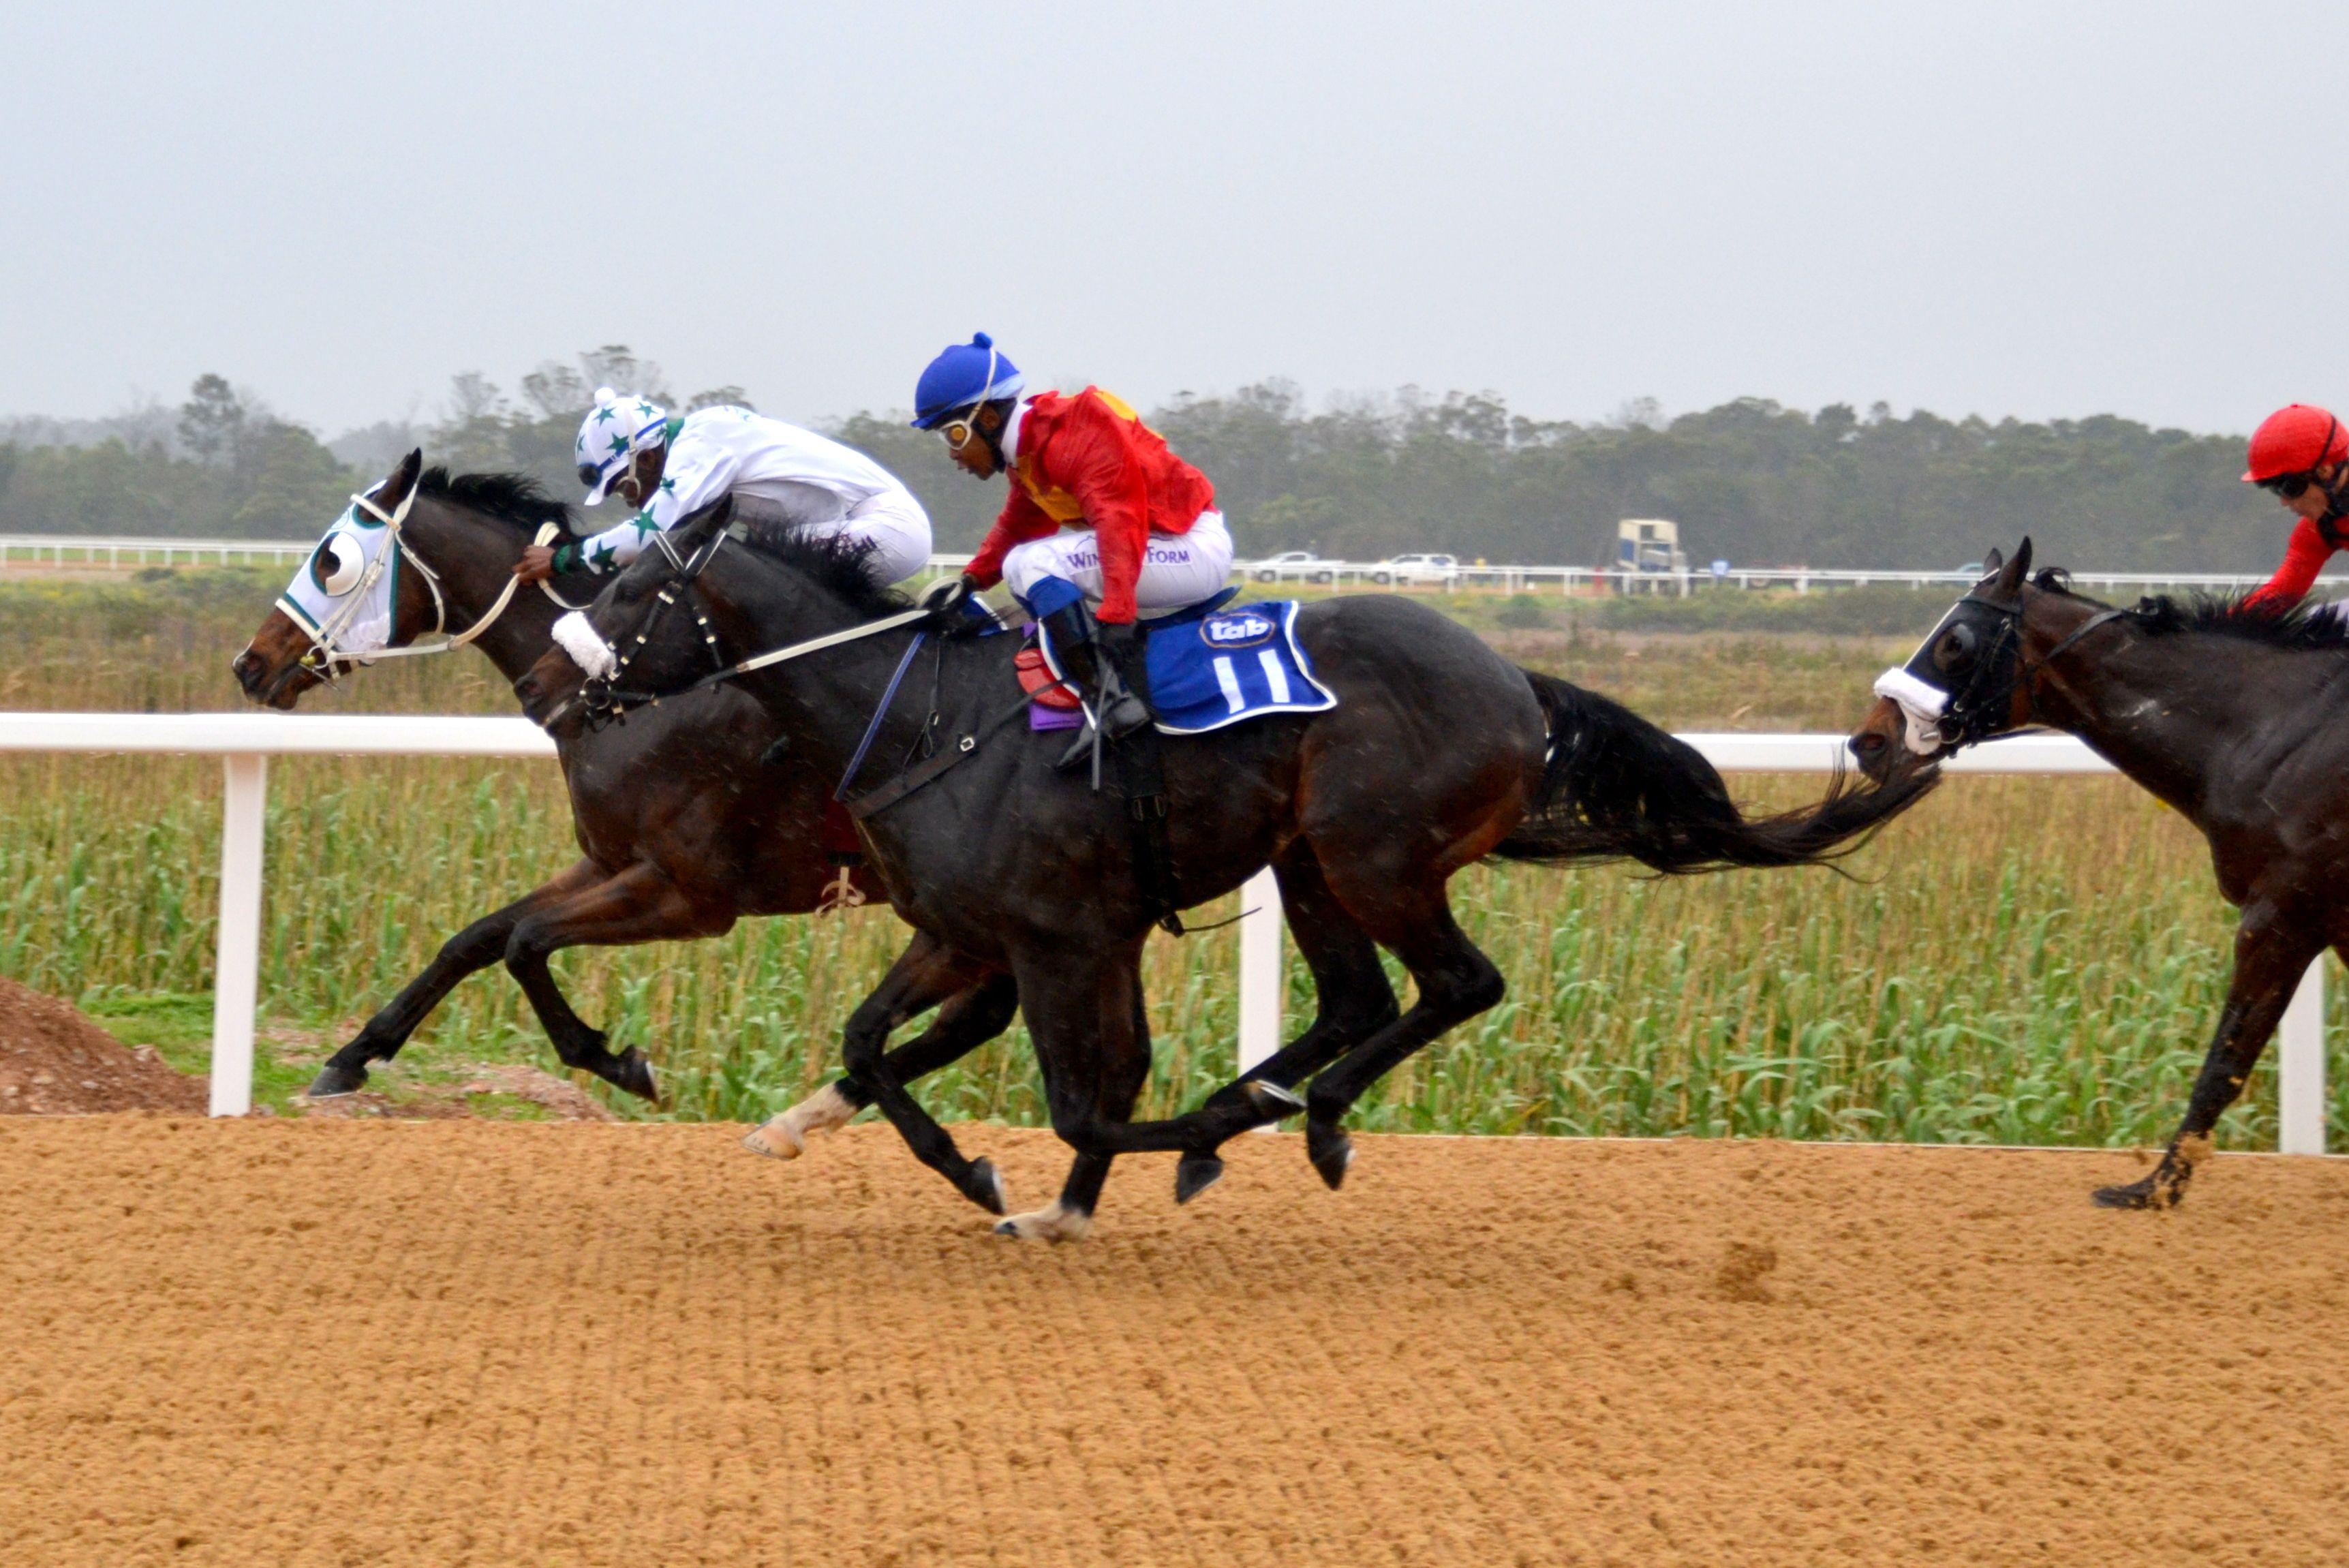 Fairview Horse Racing